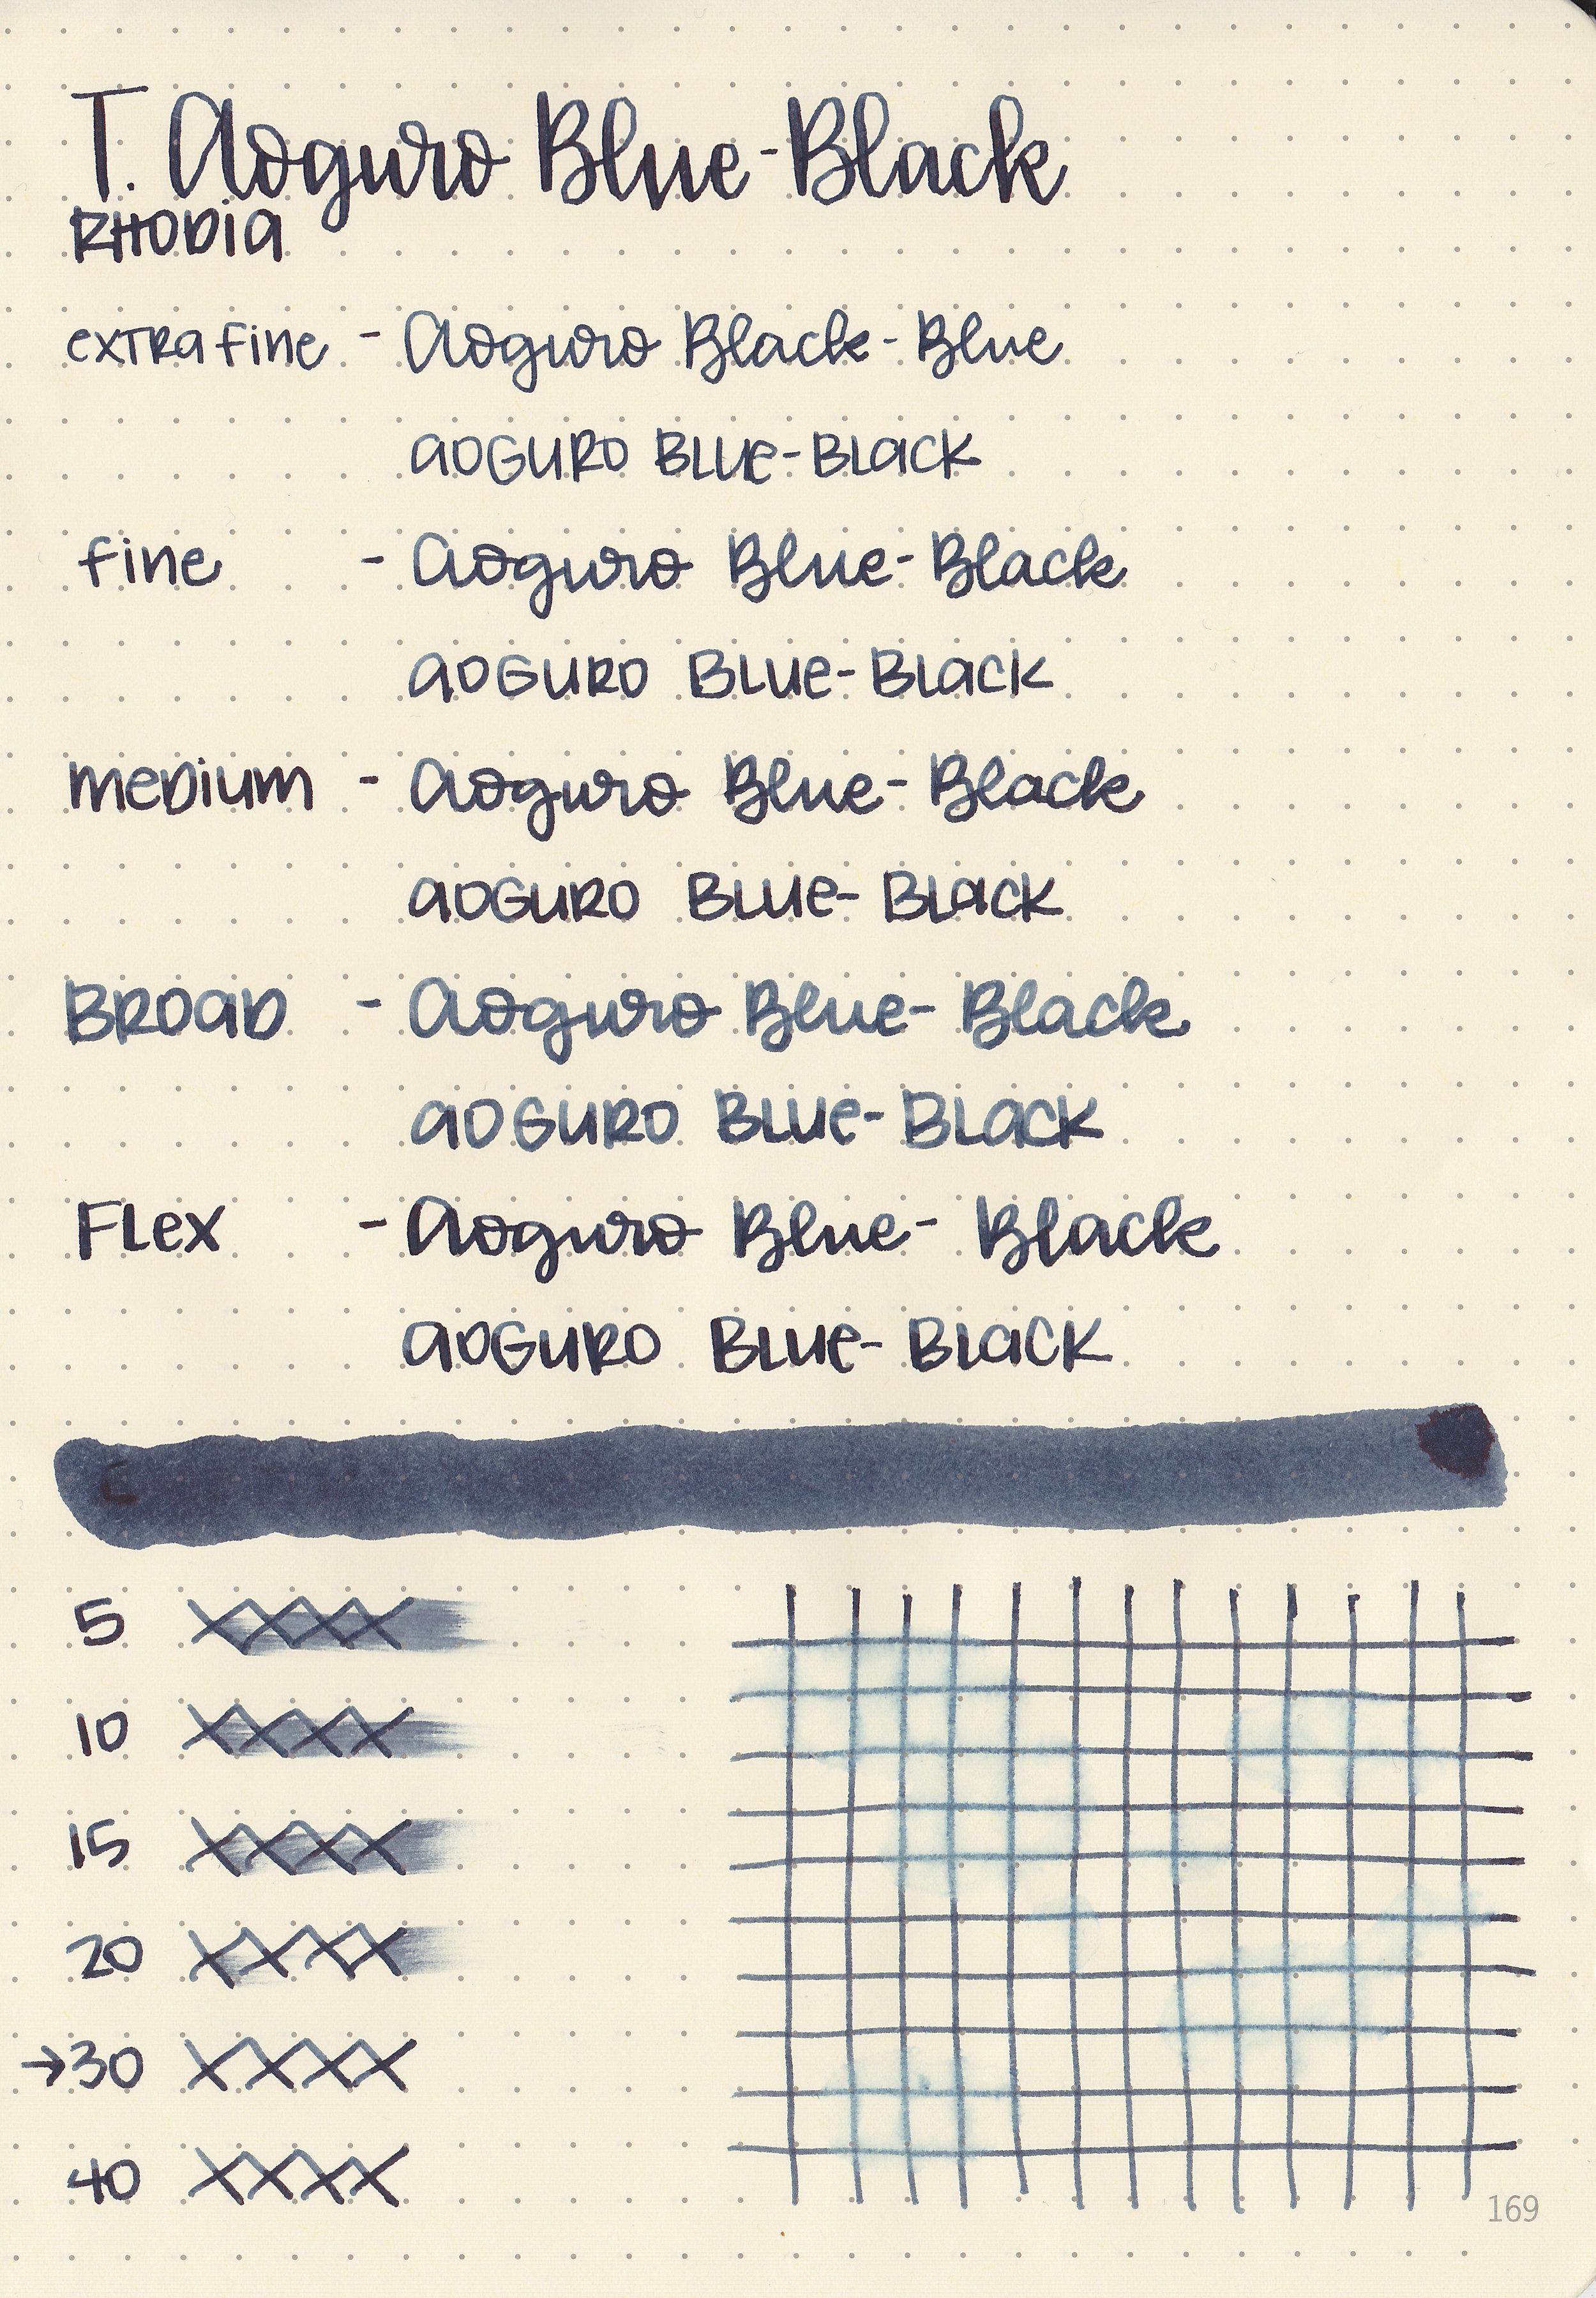 tac-aoguro-blue-black-7.jpg